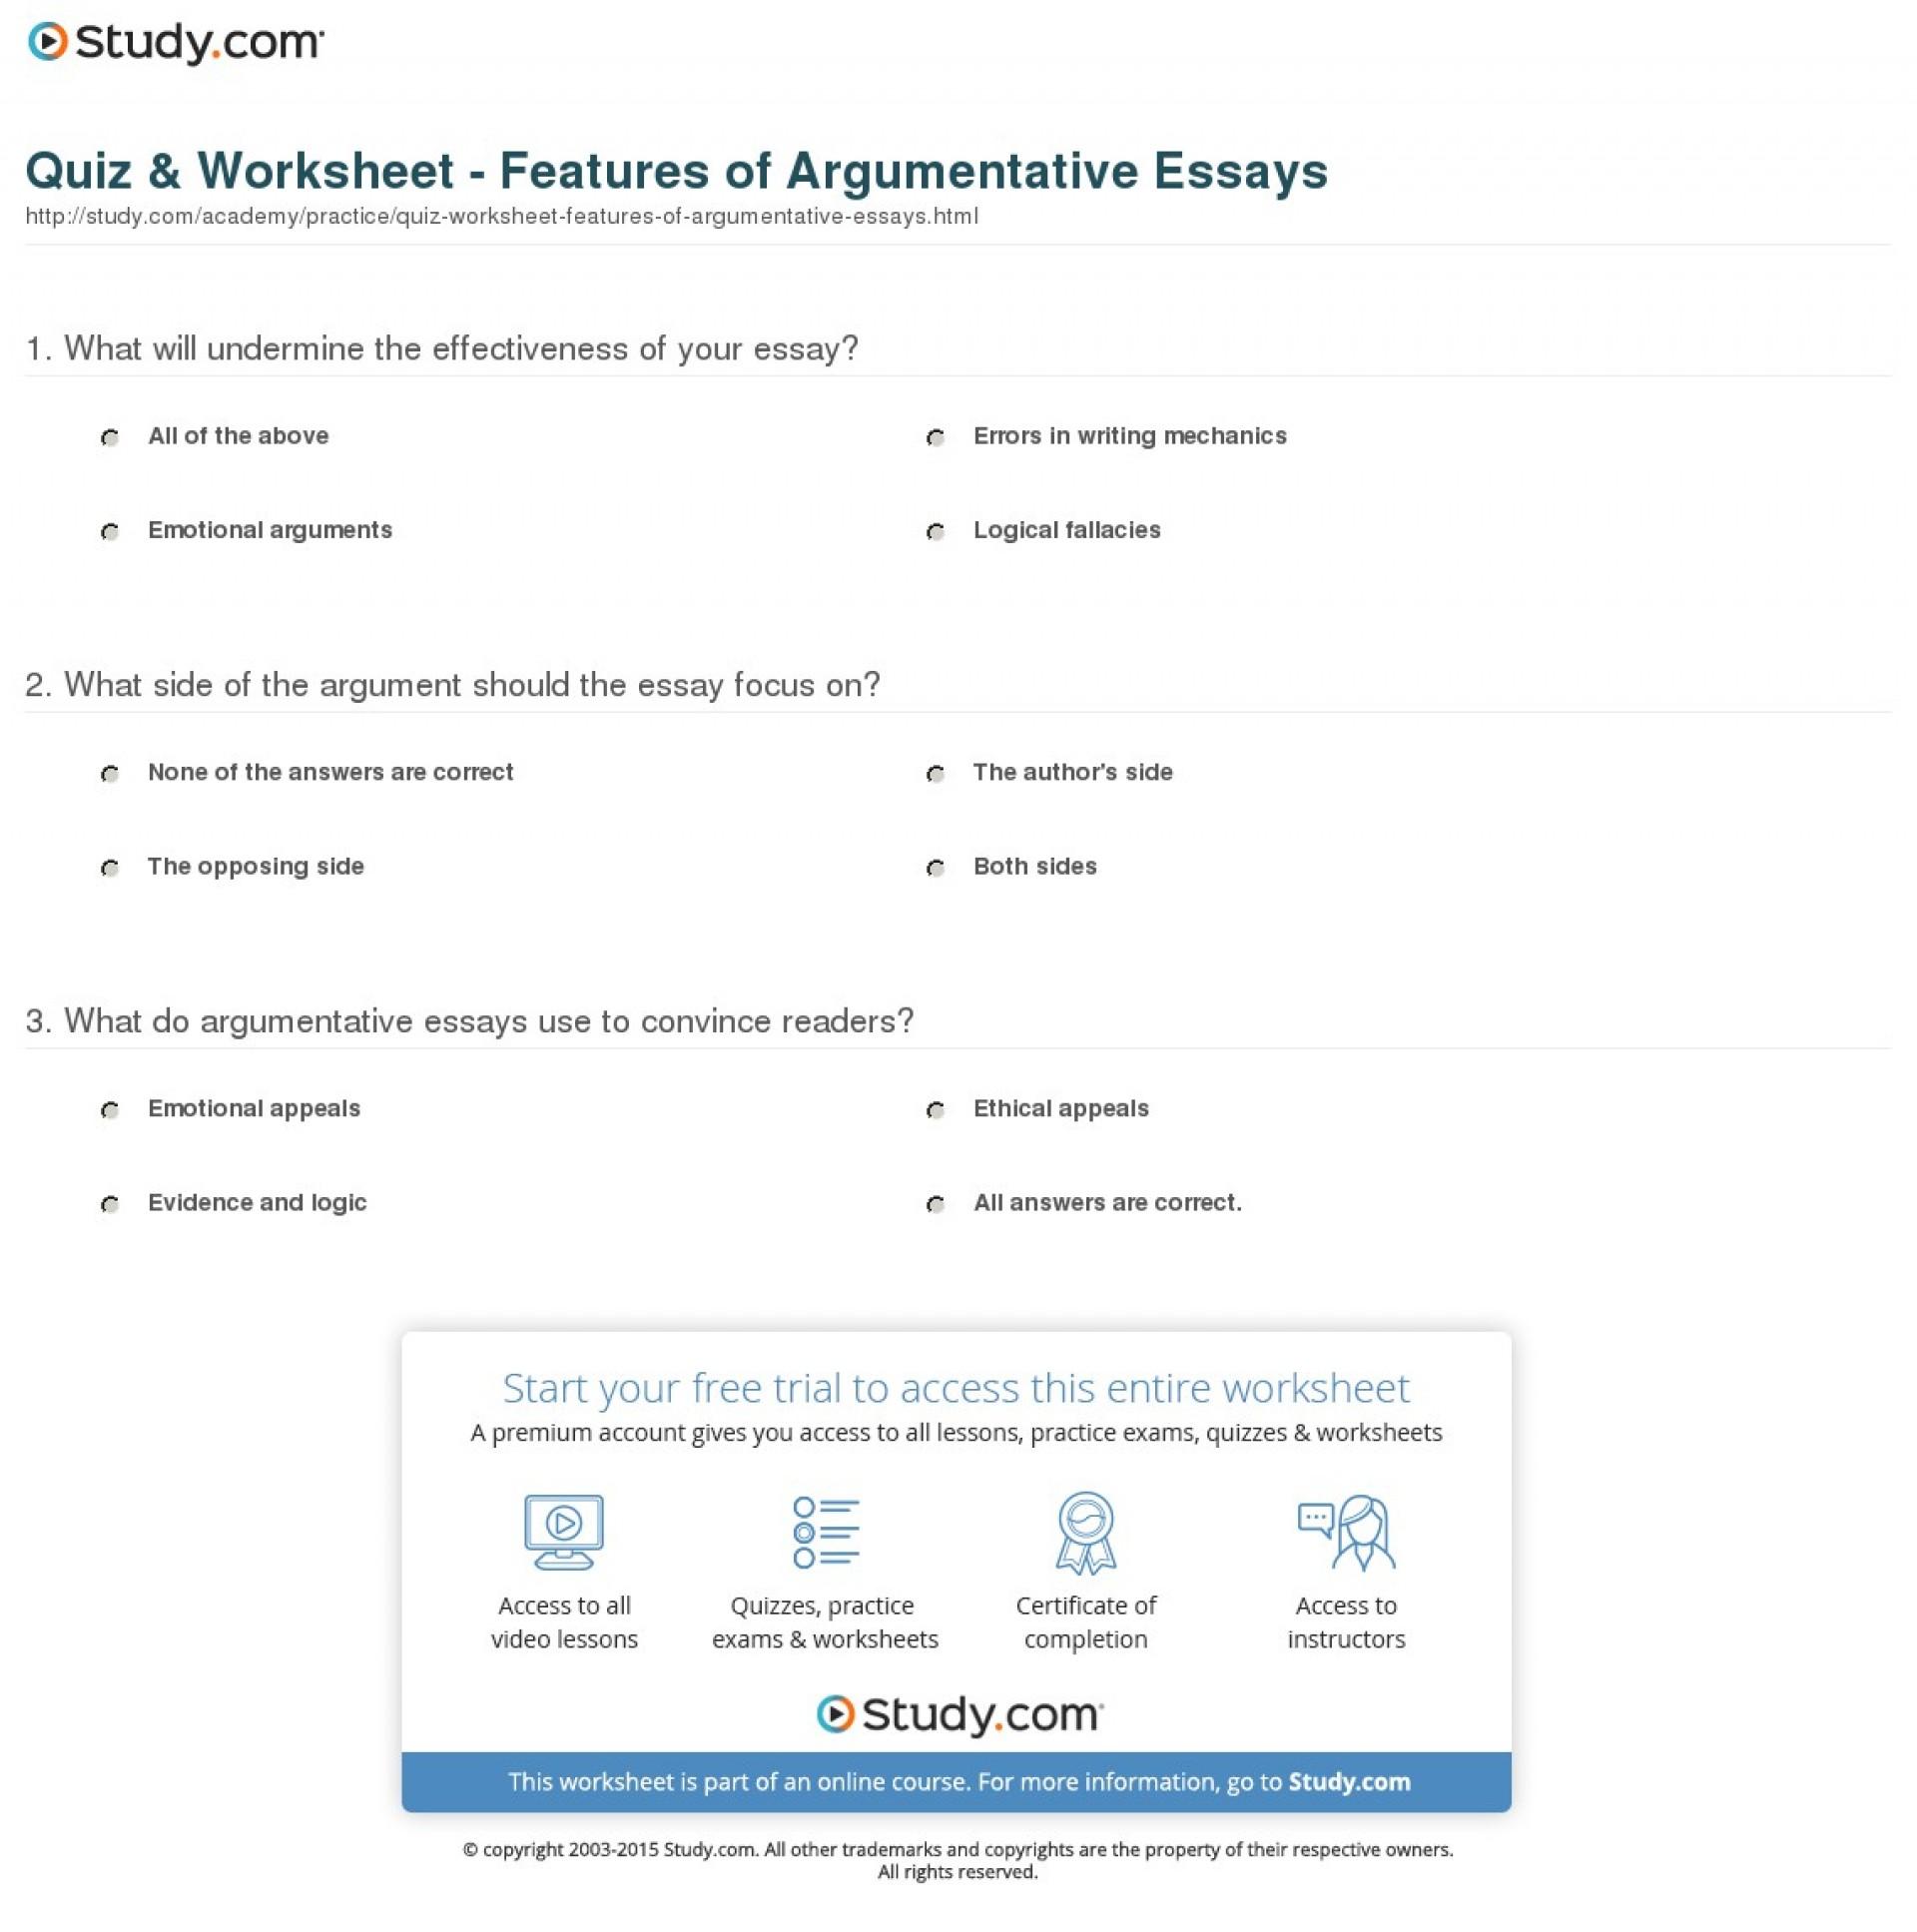 018 Essay Example Argumentative Definition Quiz Worksheet Features Of Fearsome Define Persuasive/argumentative Pdf 1920